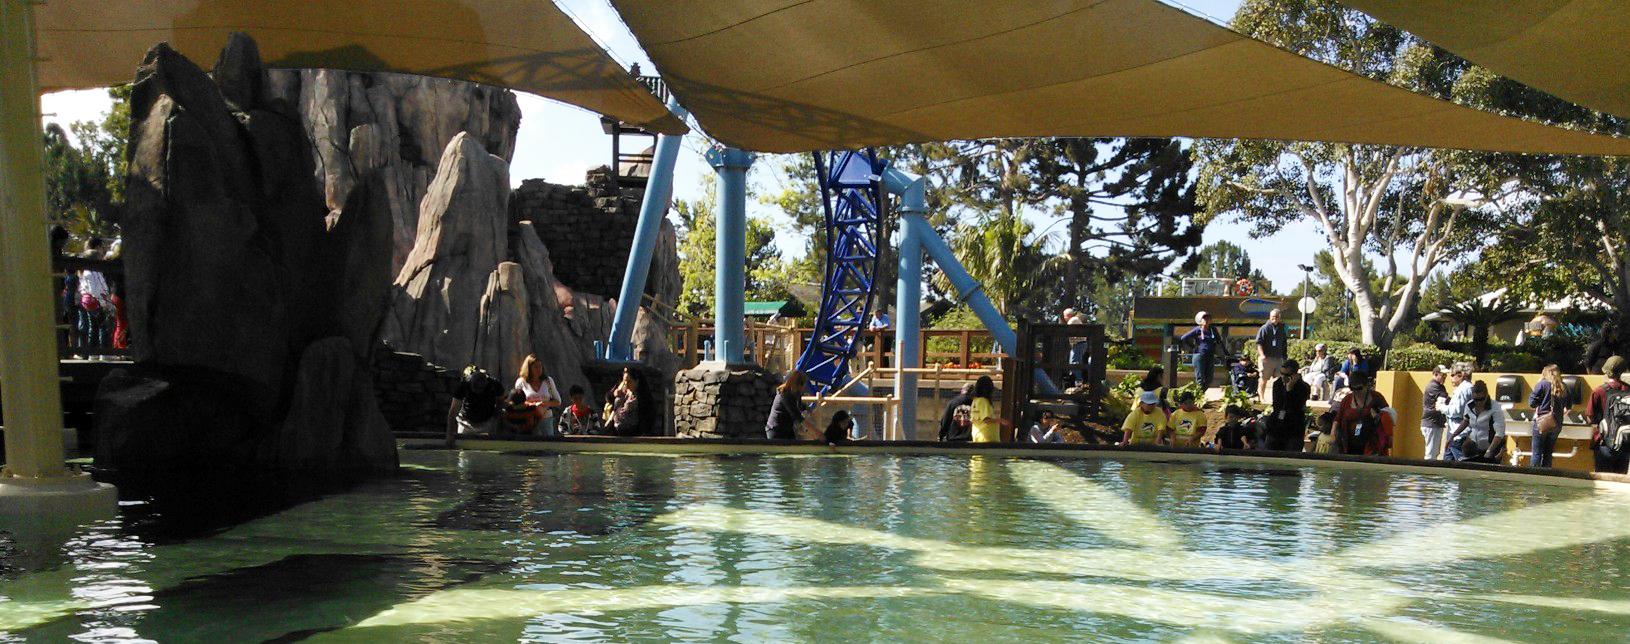 The Dominion San Antonio >> SeaWorld San Diego's New Ray Pool and Aquarium